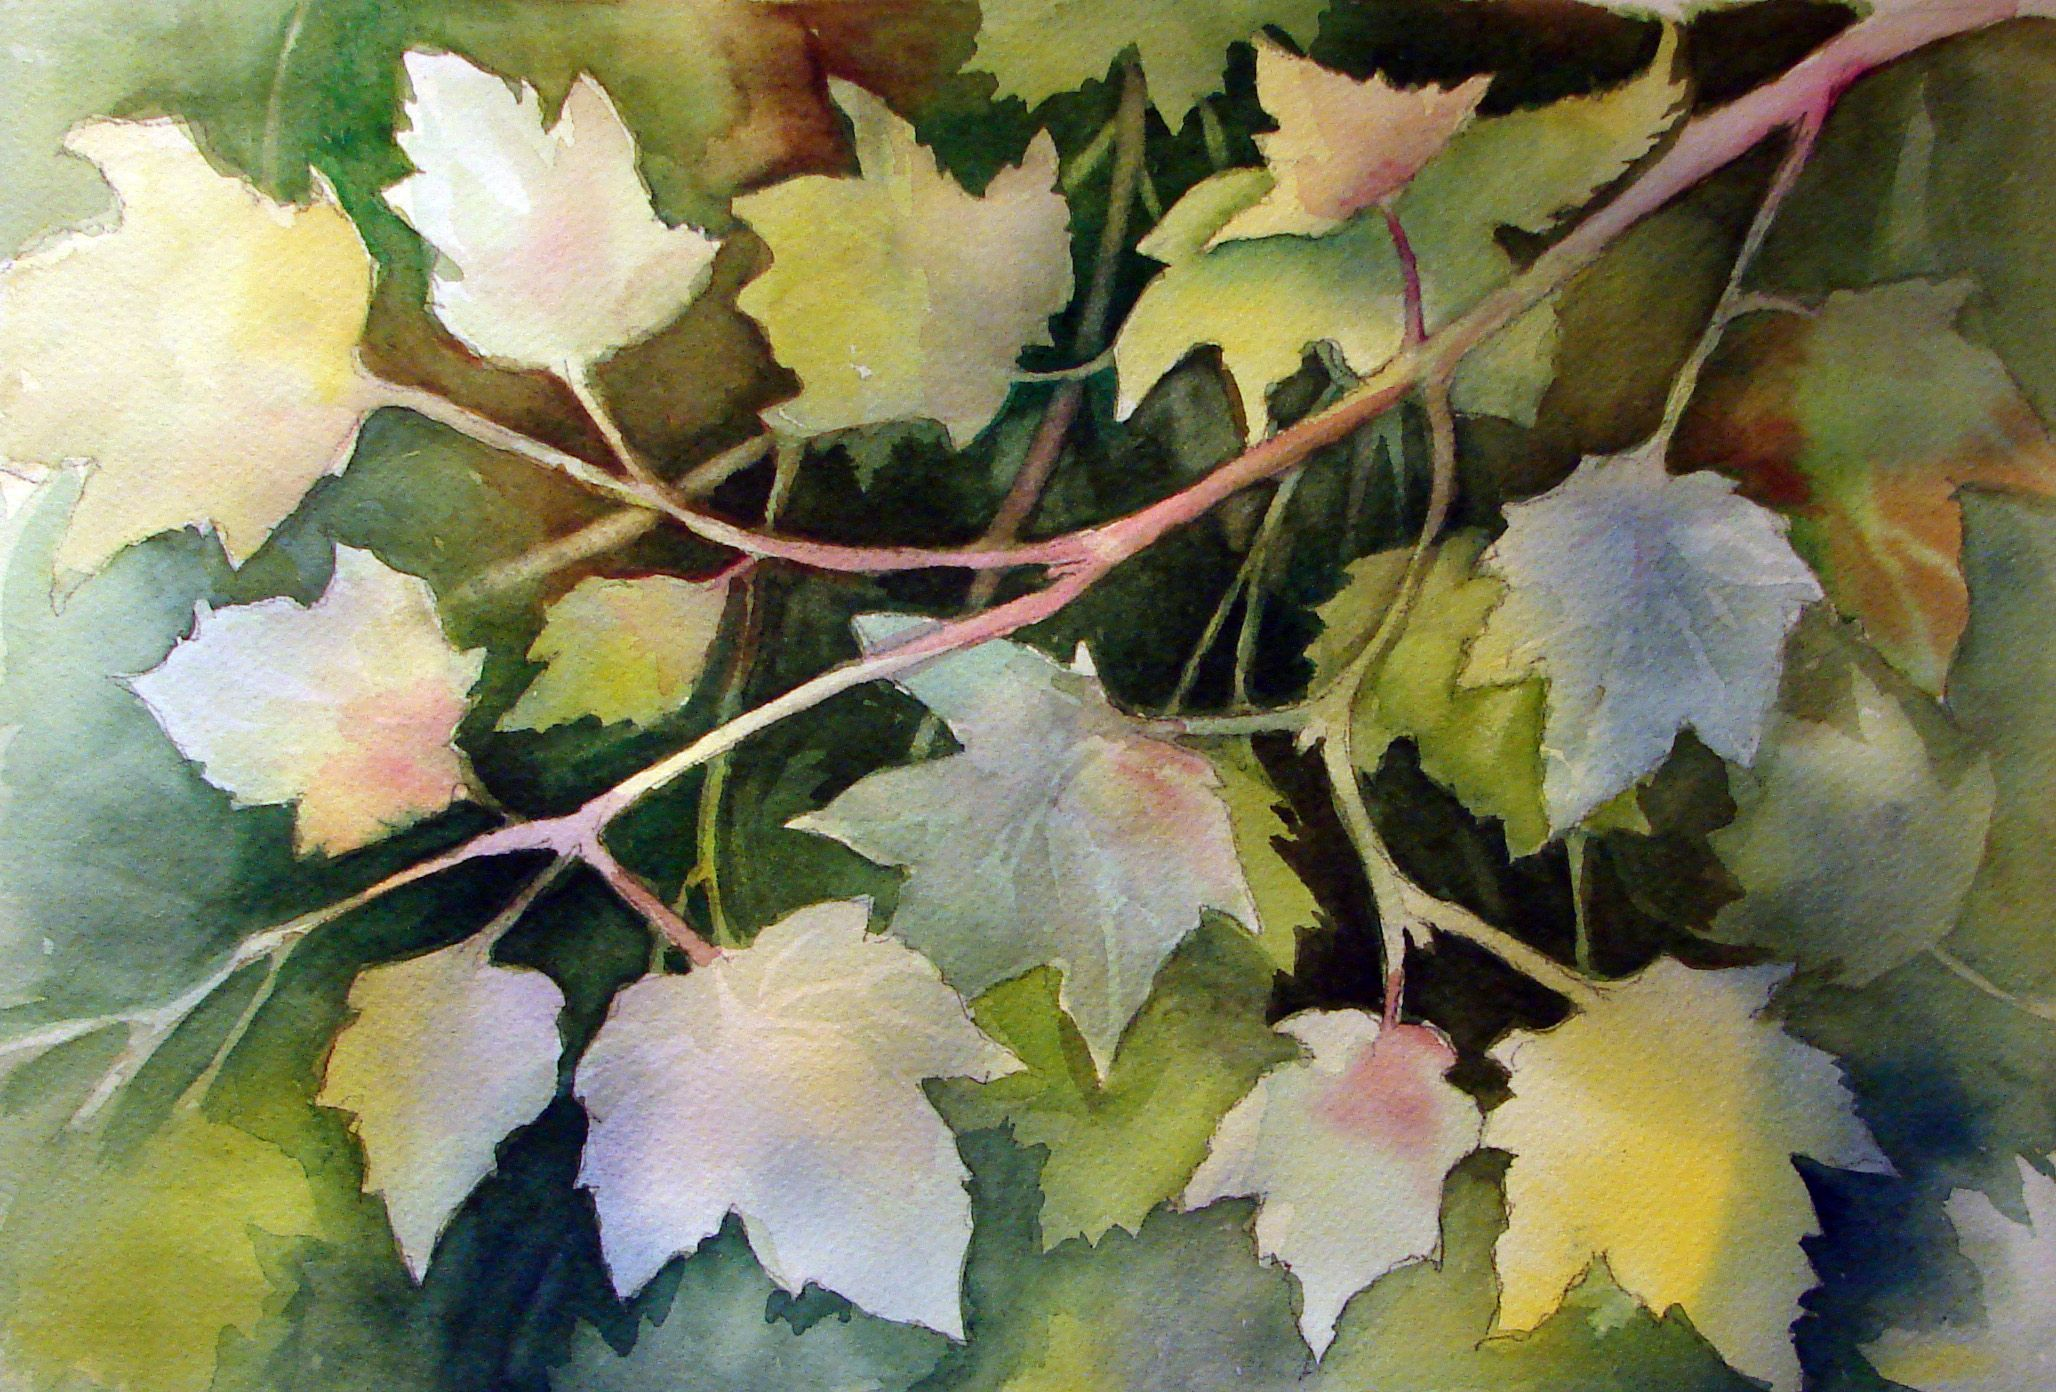 Negative Painting Around Leaves.